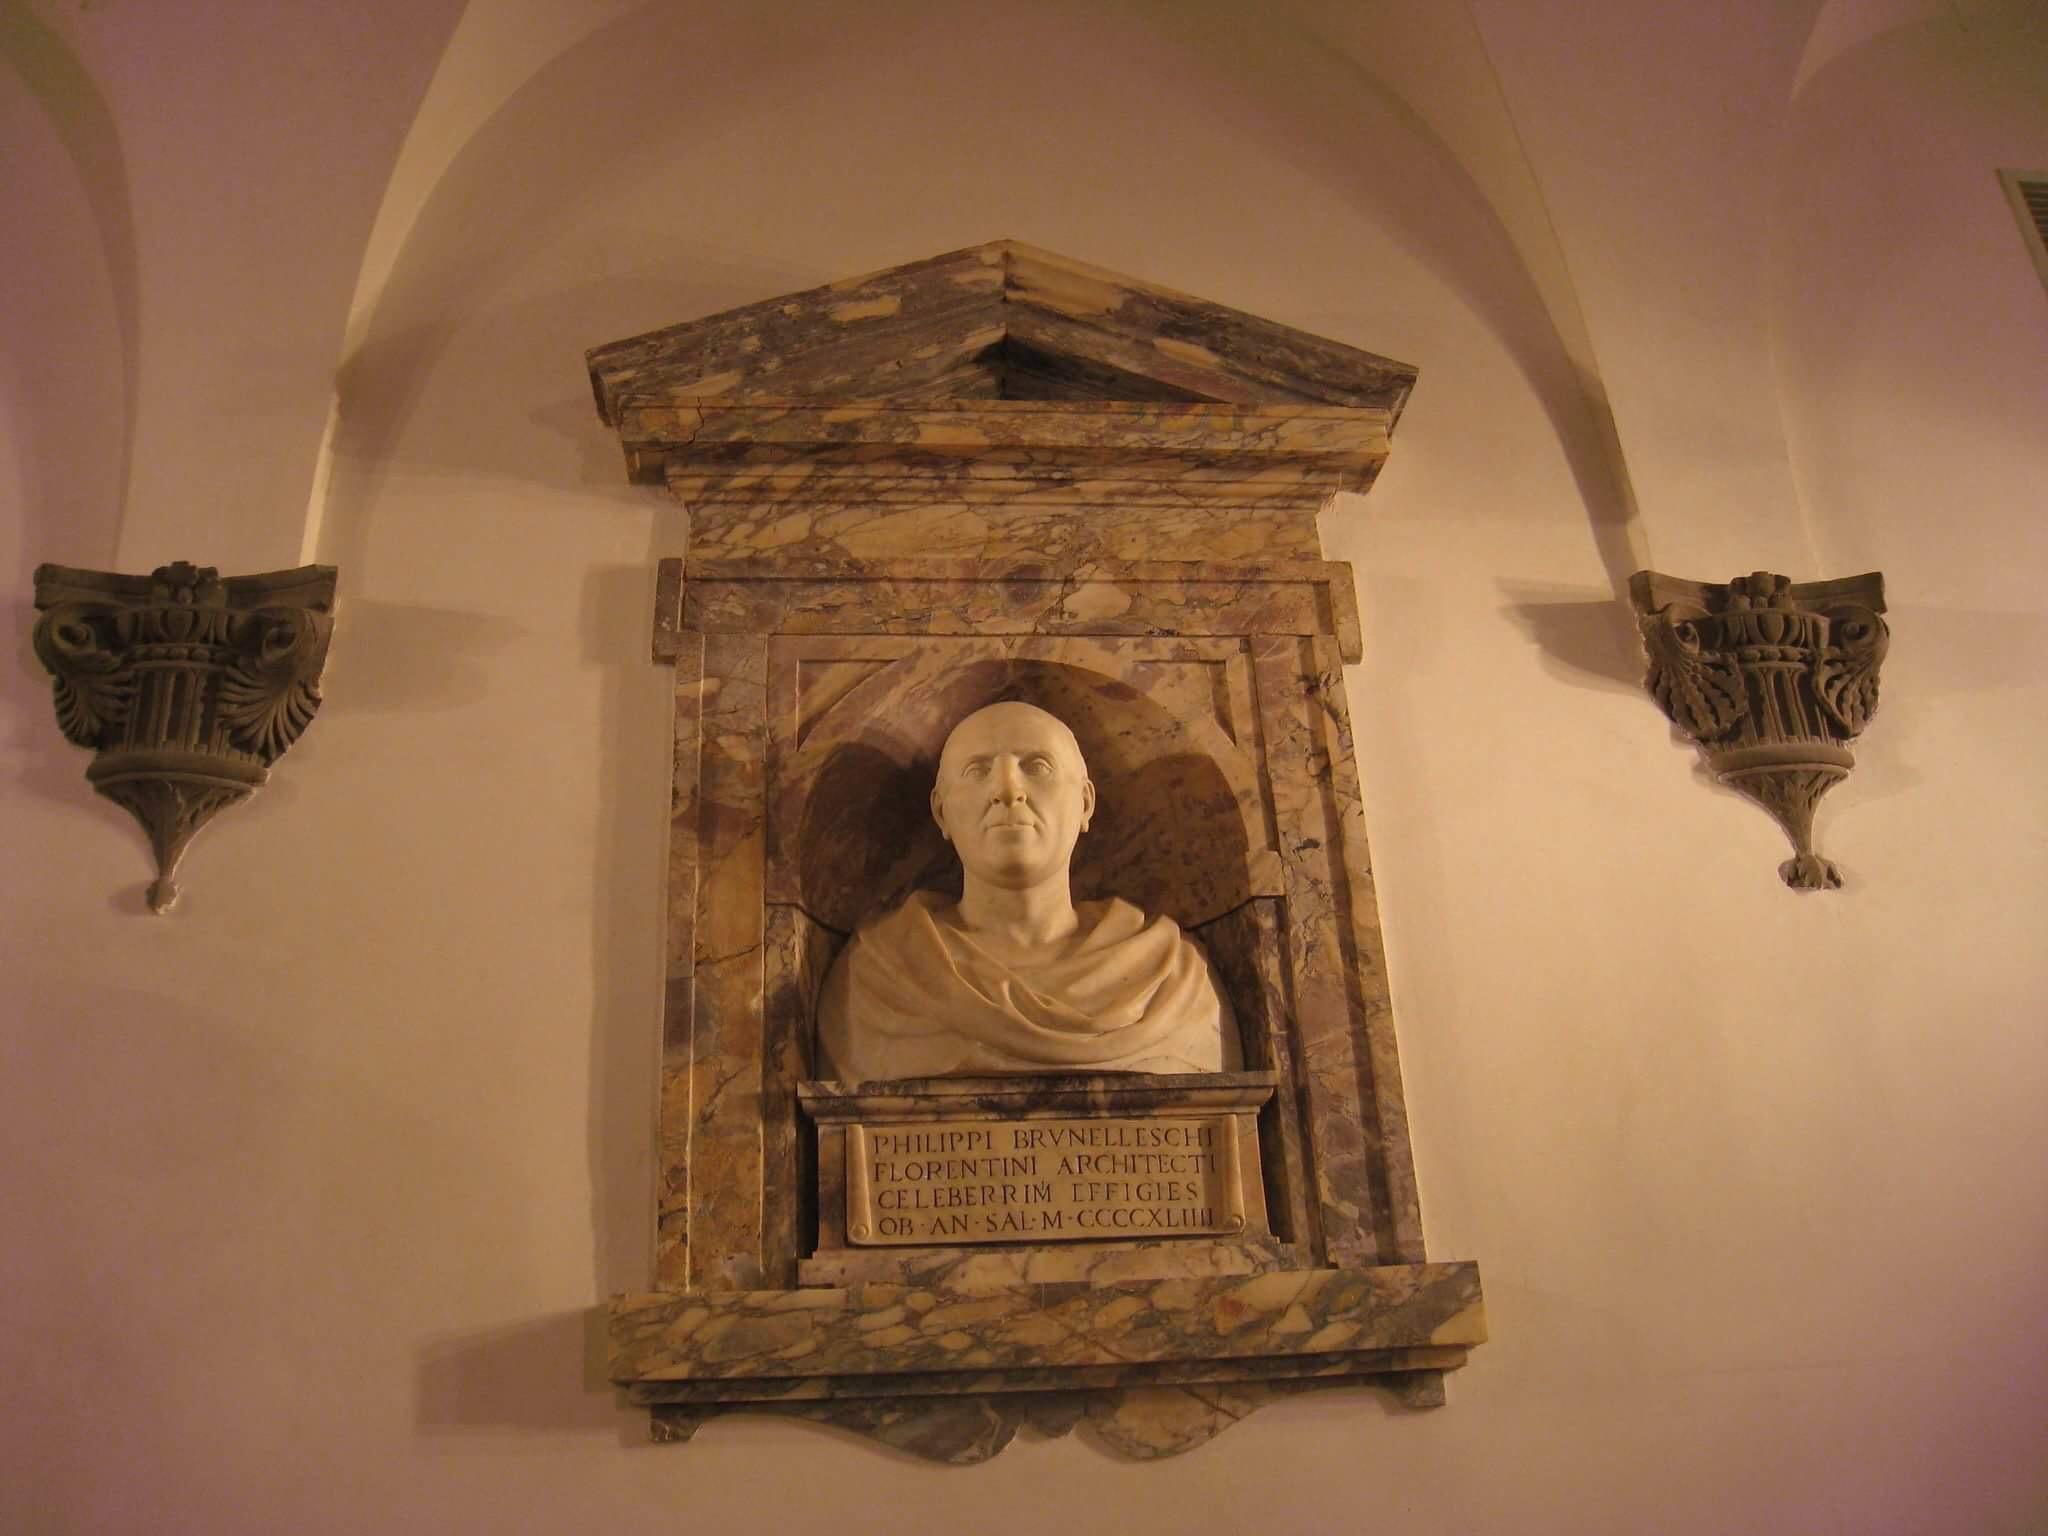 Бюст Филиппа Брунллески в Музее Собора во Флоренции.